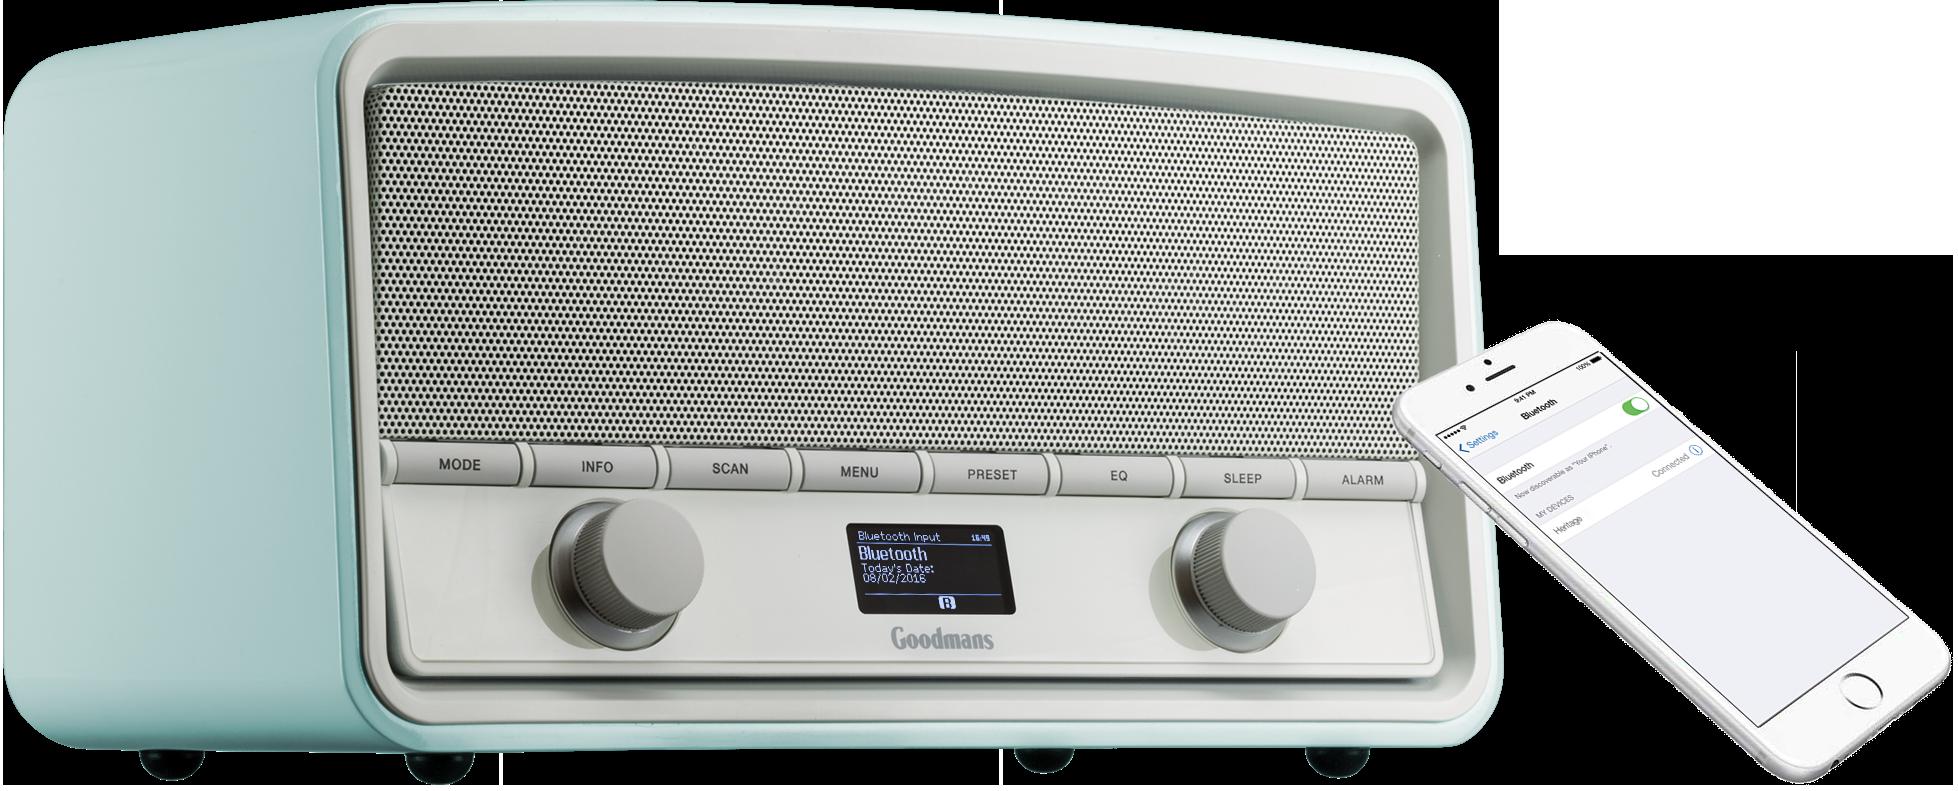 AC Powered LCD Genuine New Battery Philips AE5220//12 Portable Radio FM DAB